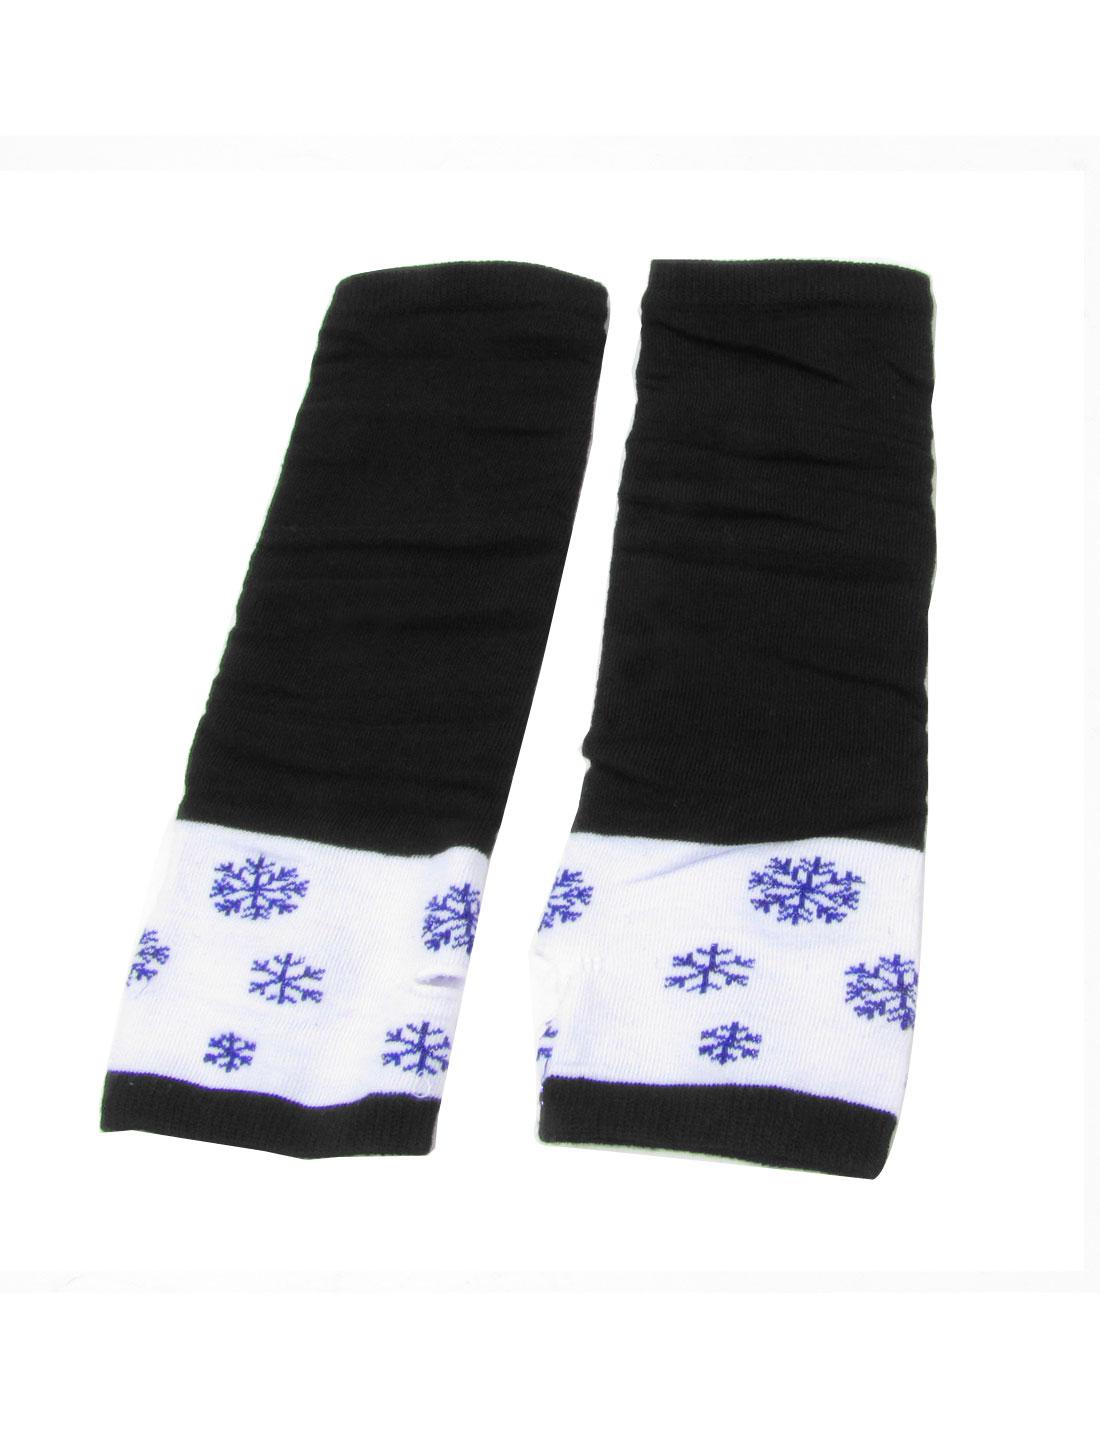 Pair Snowflake Print Elastic Wrist Arm Warmer Gloves Black White for Ladies